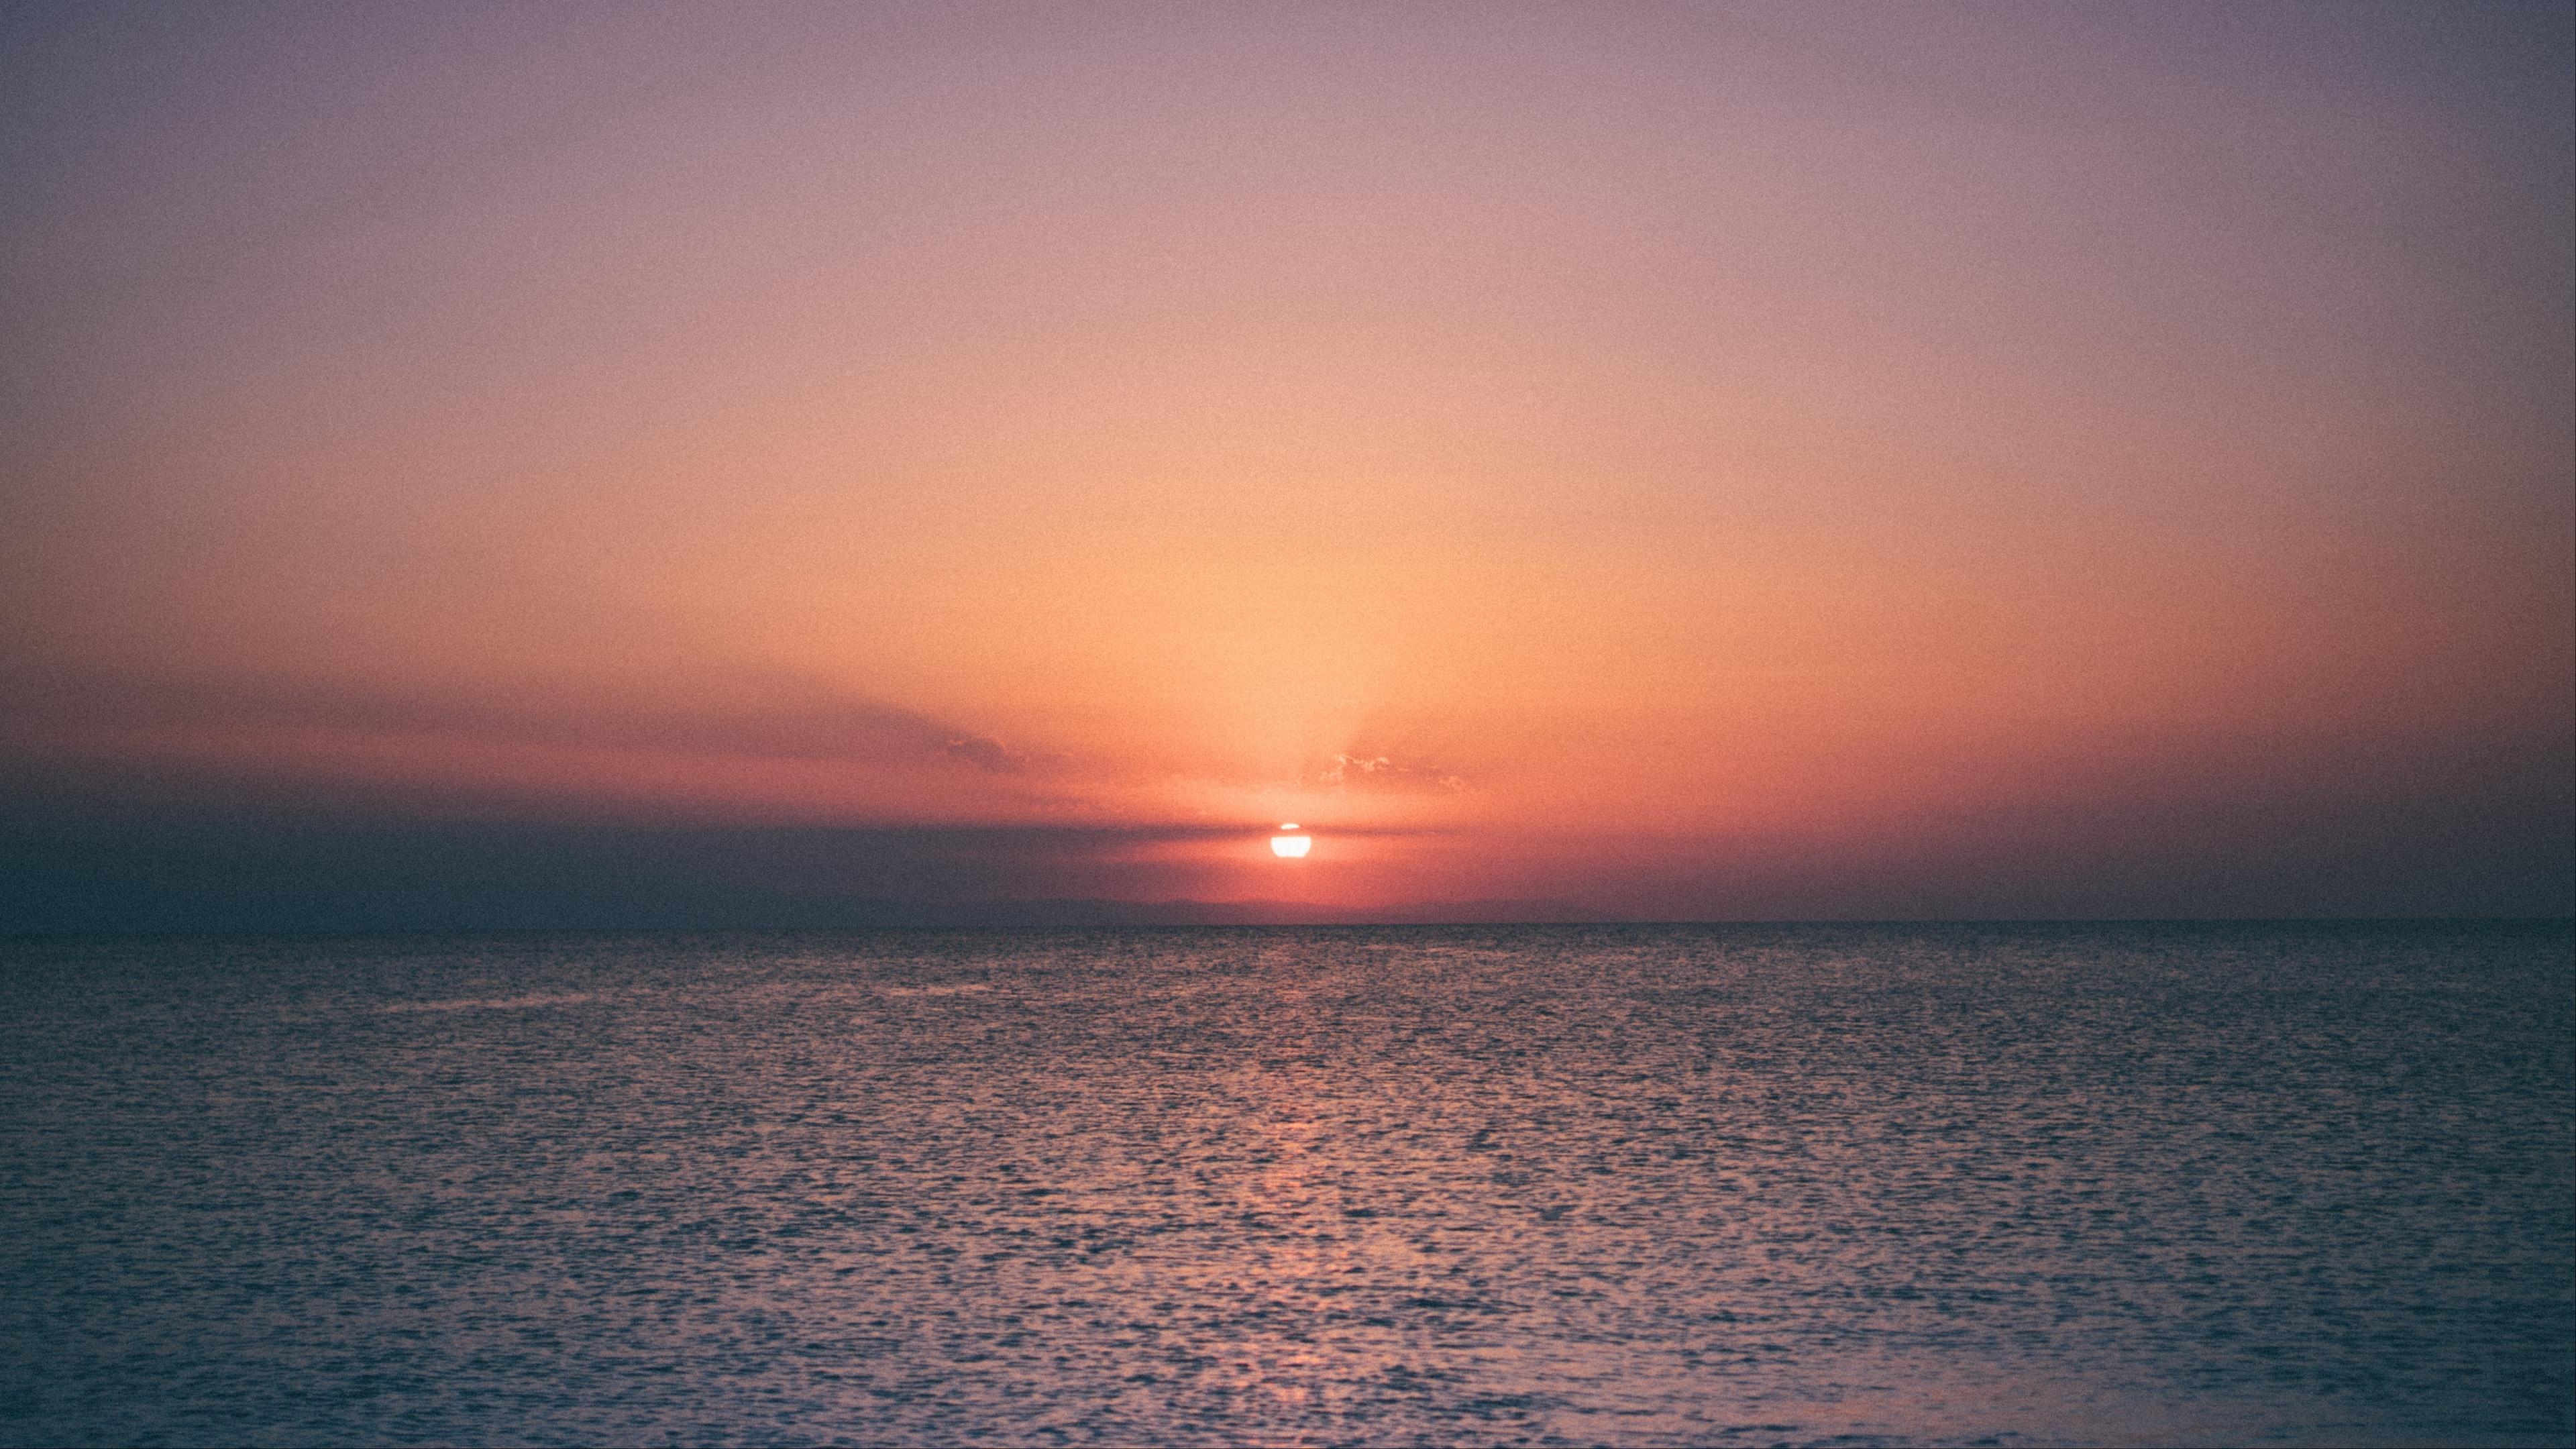 sunset horizon sea 4k 1541114029 - sunset, horizon, sea 4k - sunset, Sea, Horizon